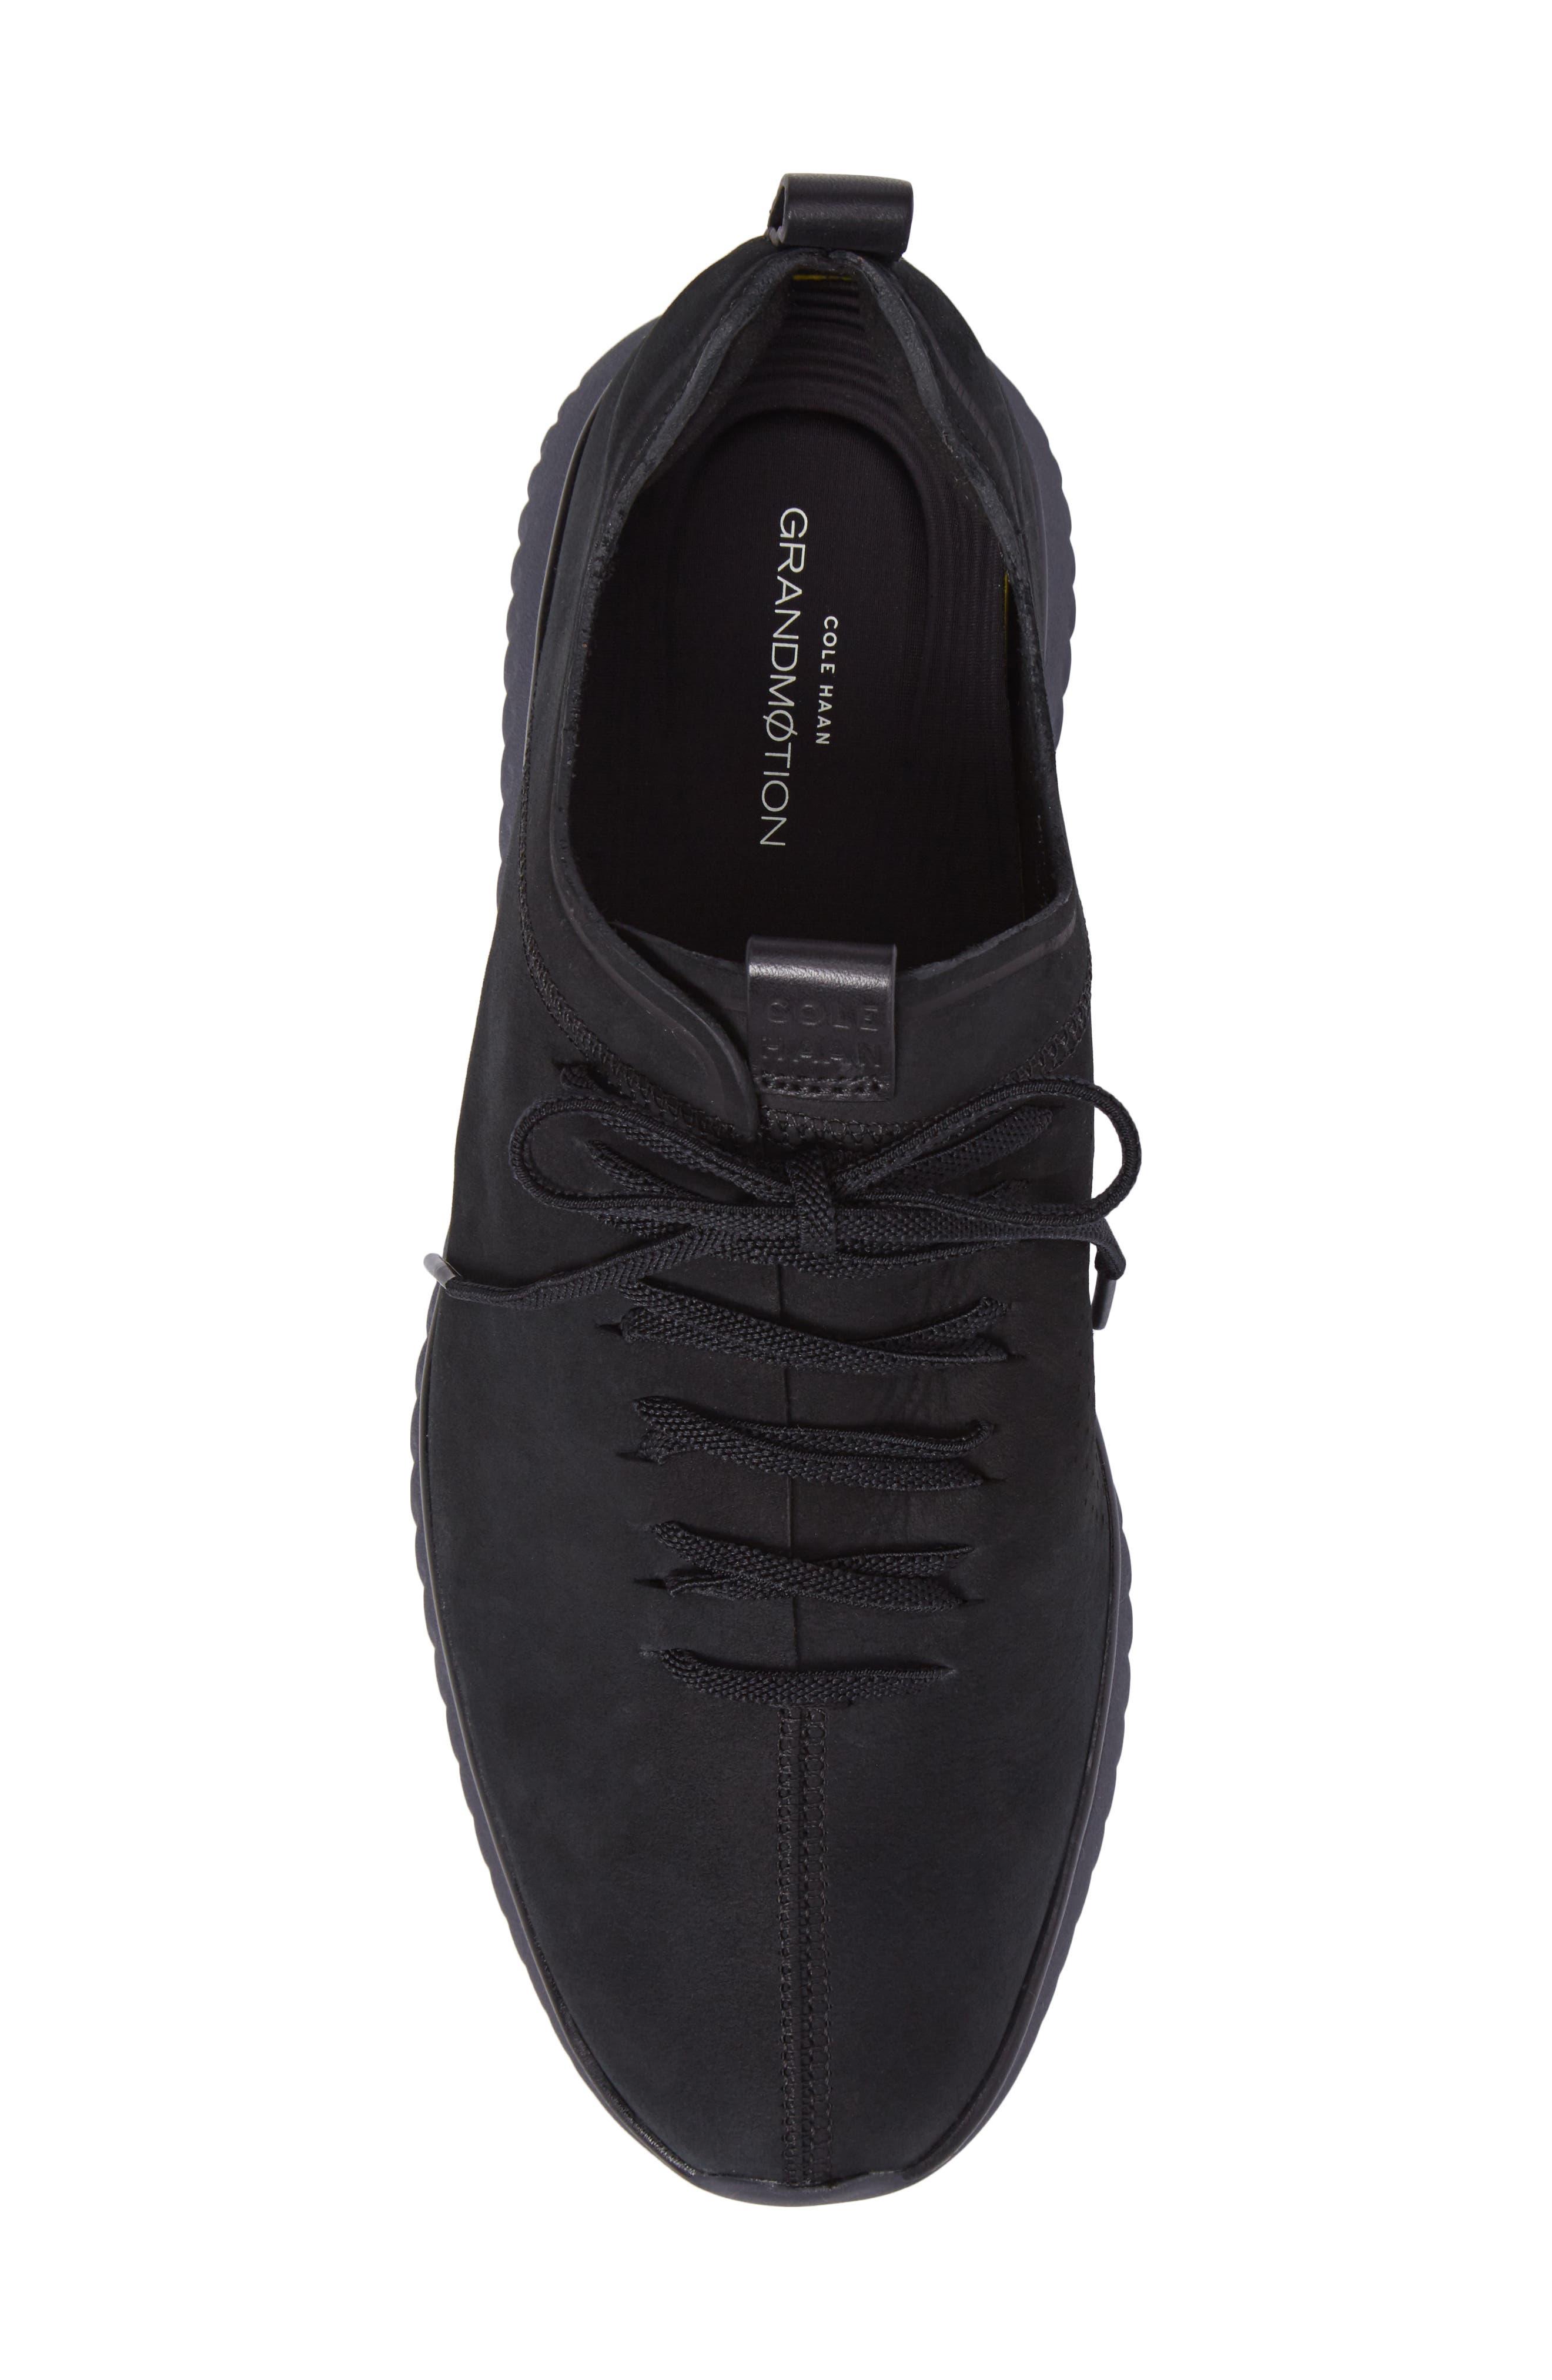 2.ZeroGrand Sneaker,                             Alternate thumbnail 5, color,                             001